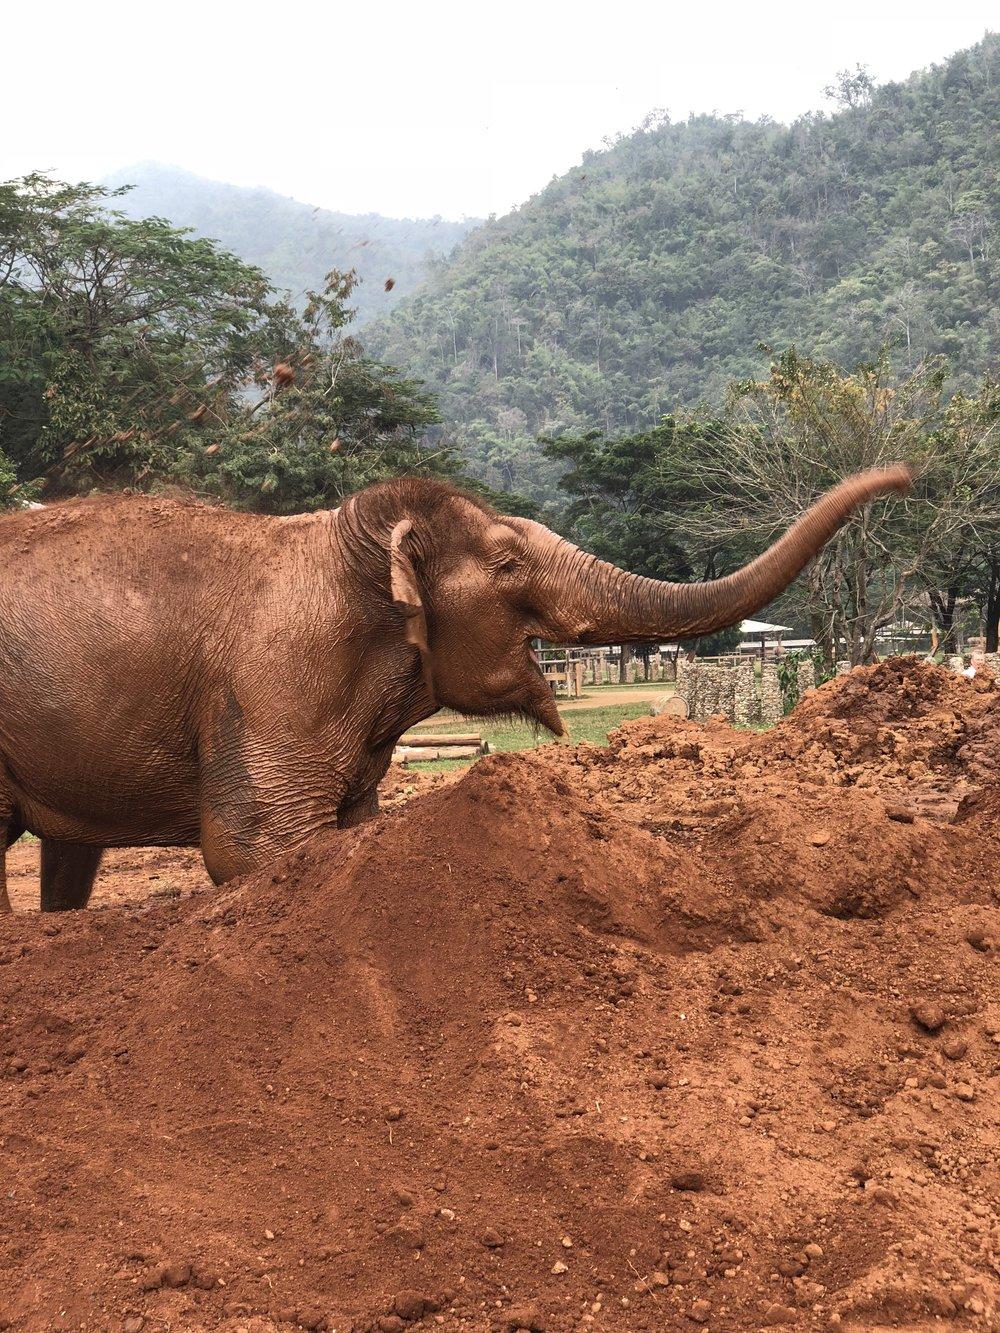 Elephant mudbath | Choosing an ethical elephant sanctuary | The Lavorato Lens